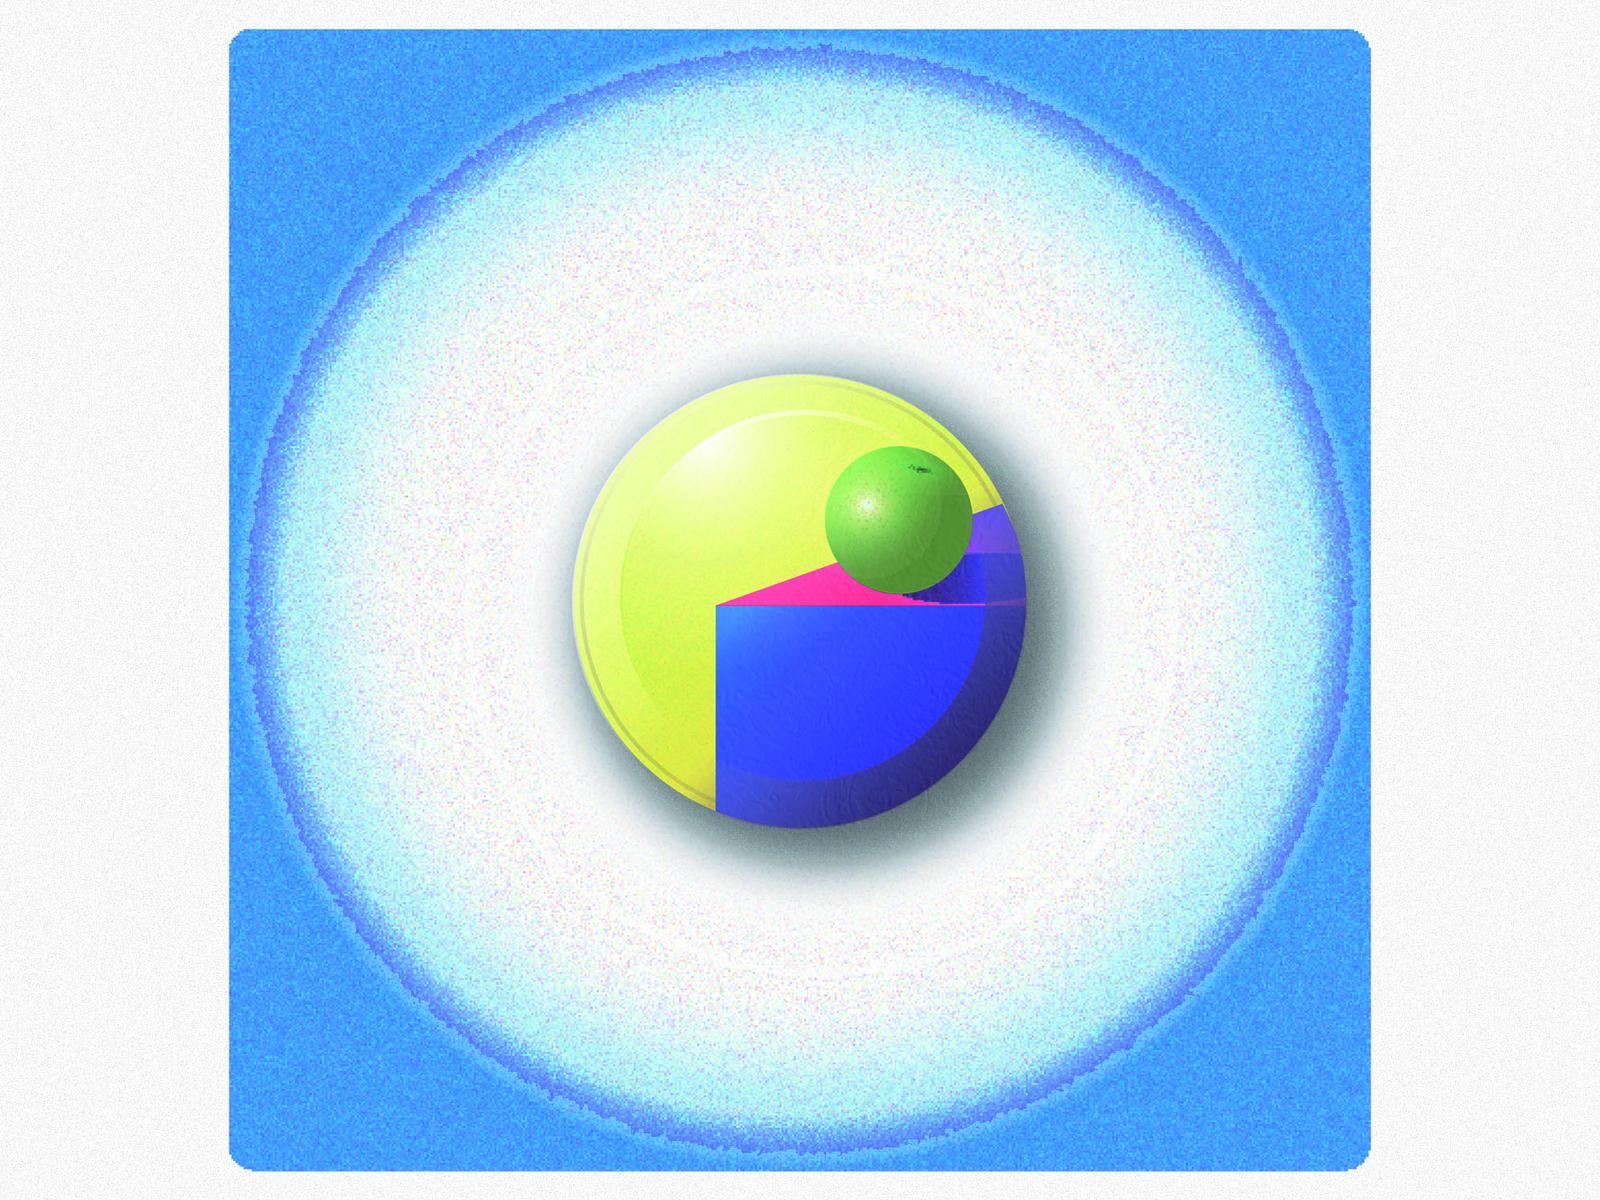 Apple composition grain logo adobe illustrator app ui icon website adobe creative suite illustrator graphic design vector web badge illustration branding art flat design clean